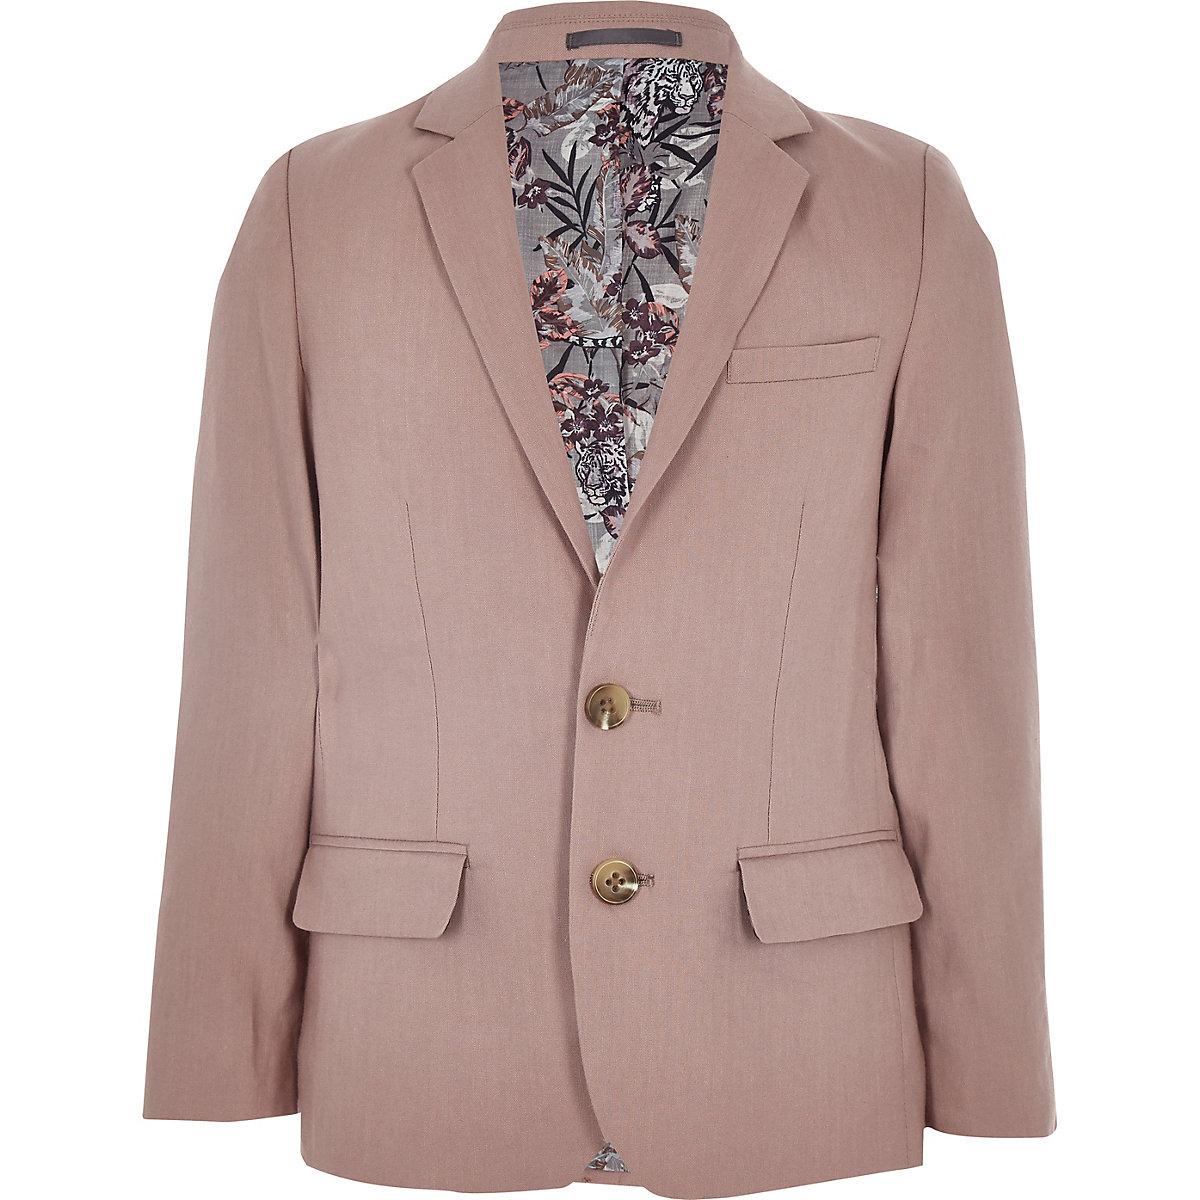 Boys pink linen suit blazer